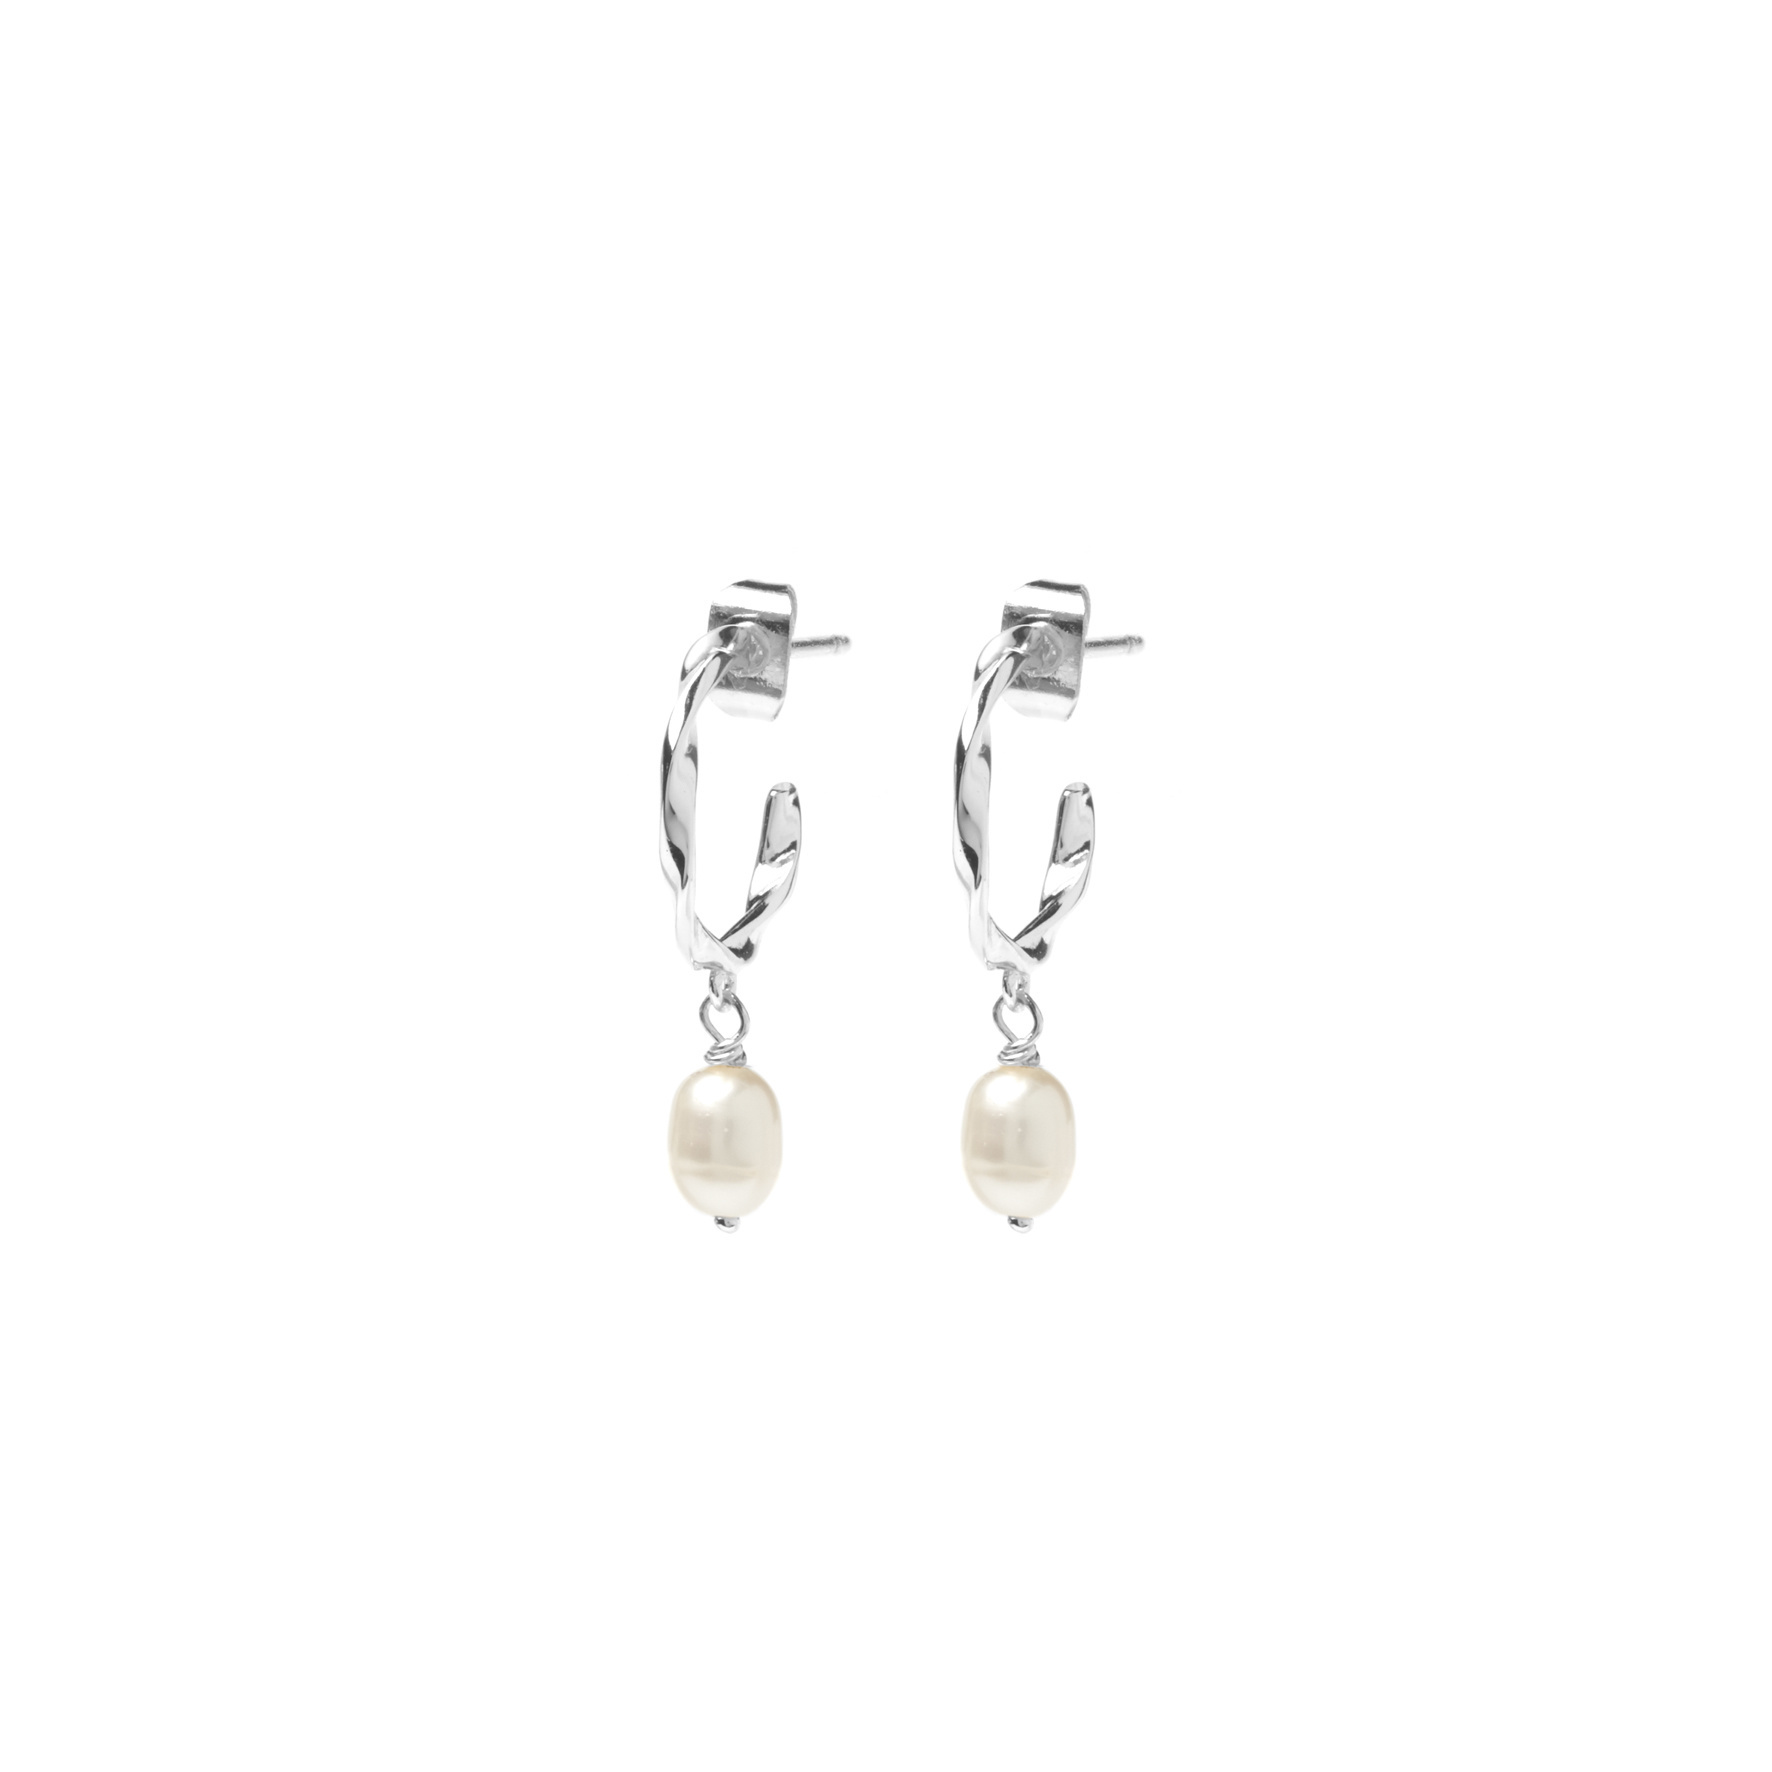 Riverstones Jewels Earrings Neptune Hoops silver plated